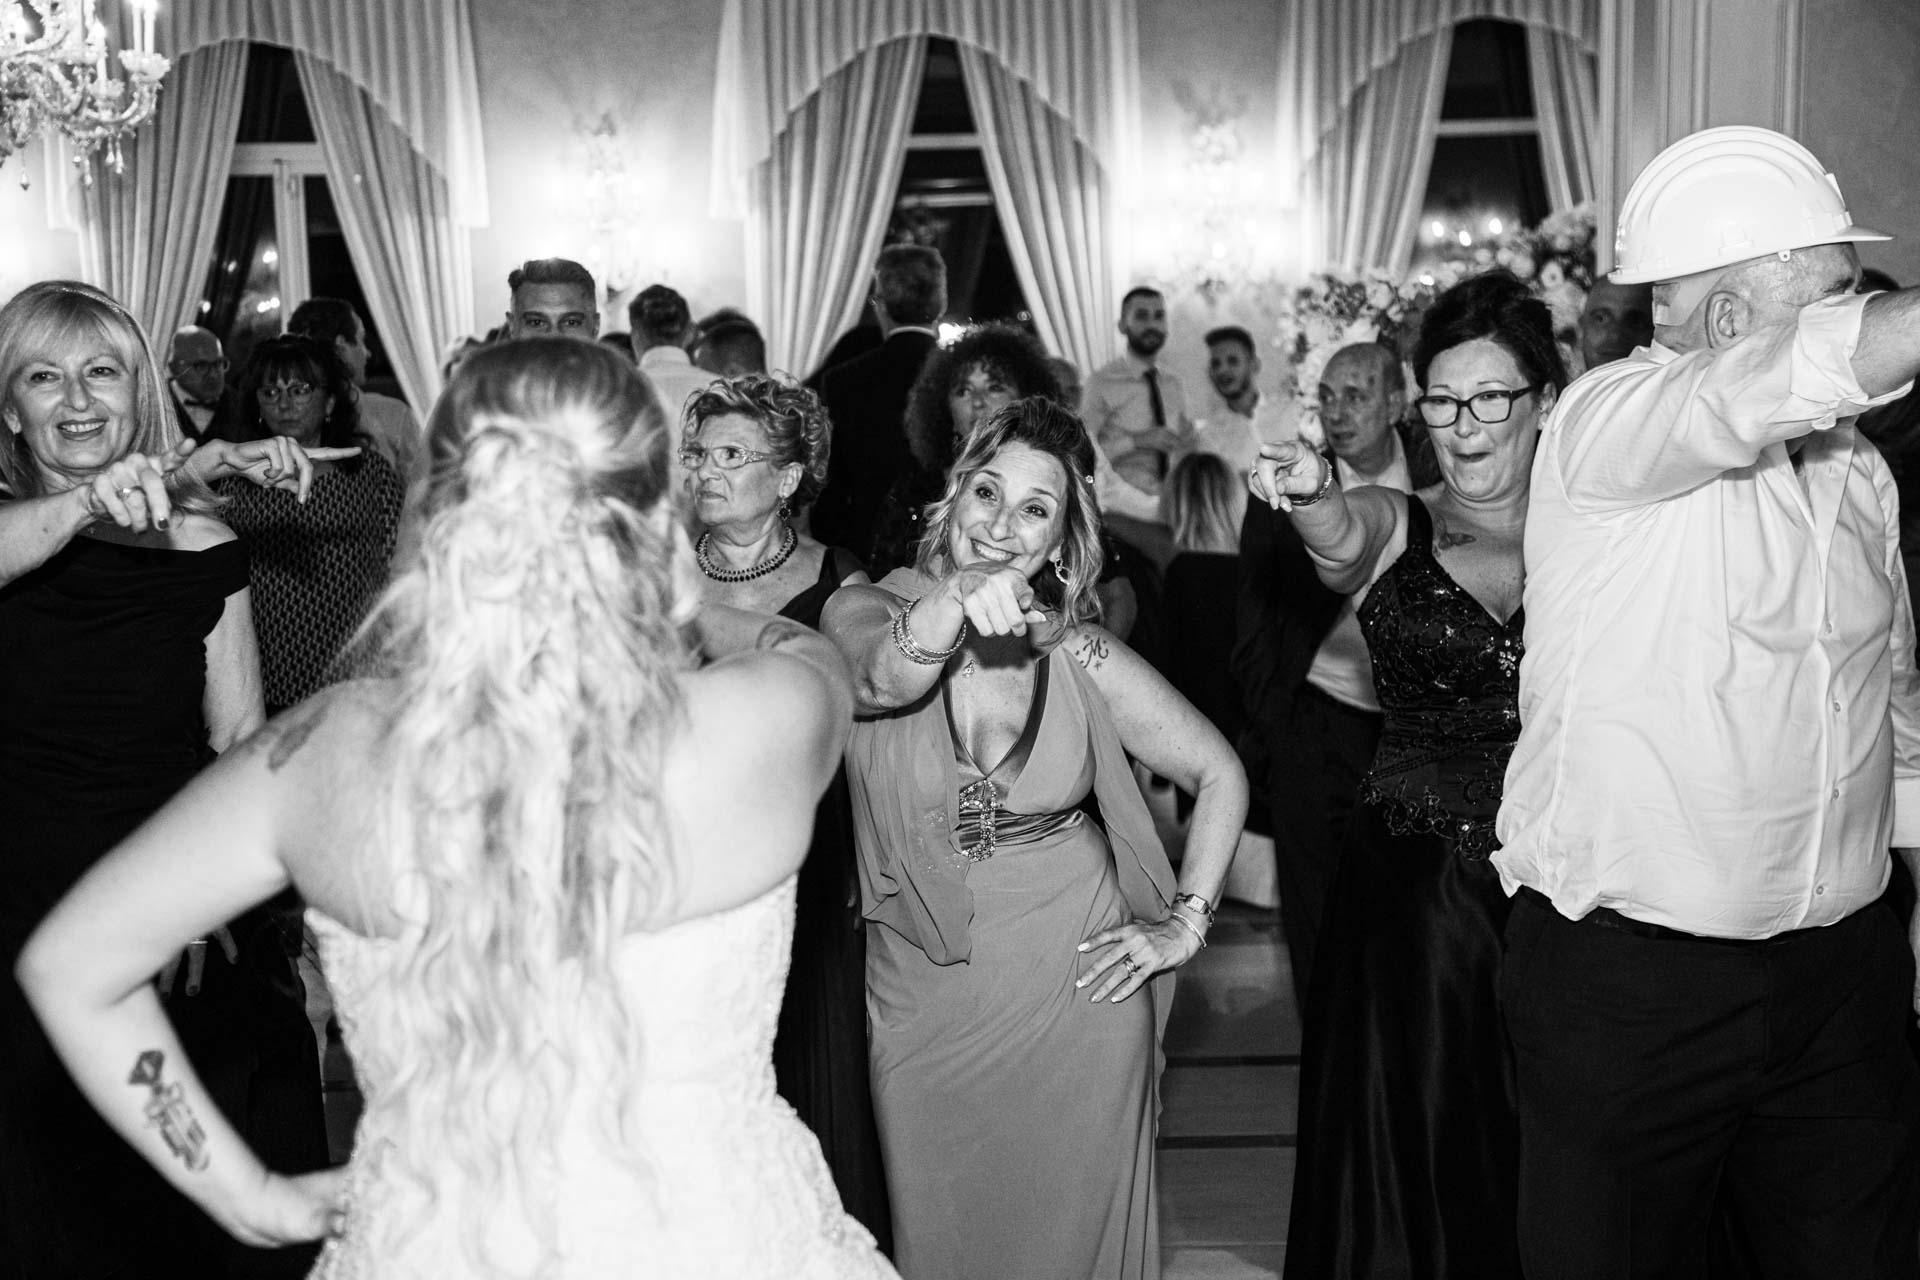 sposa ballo ricevimento bianco nero